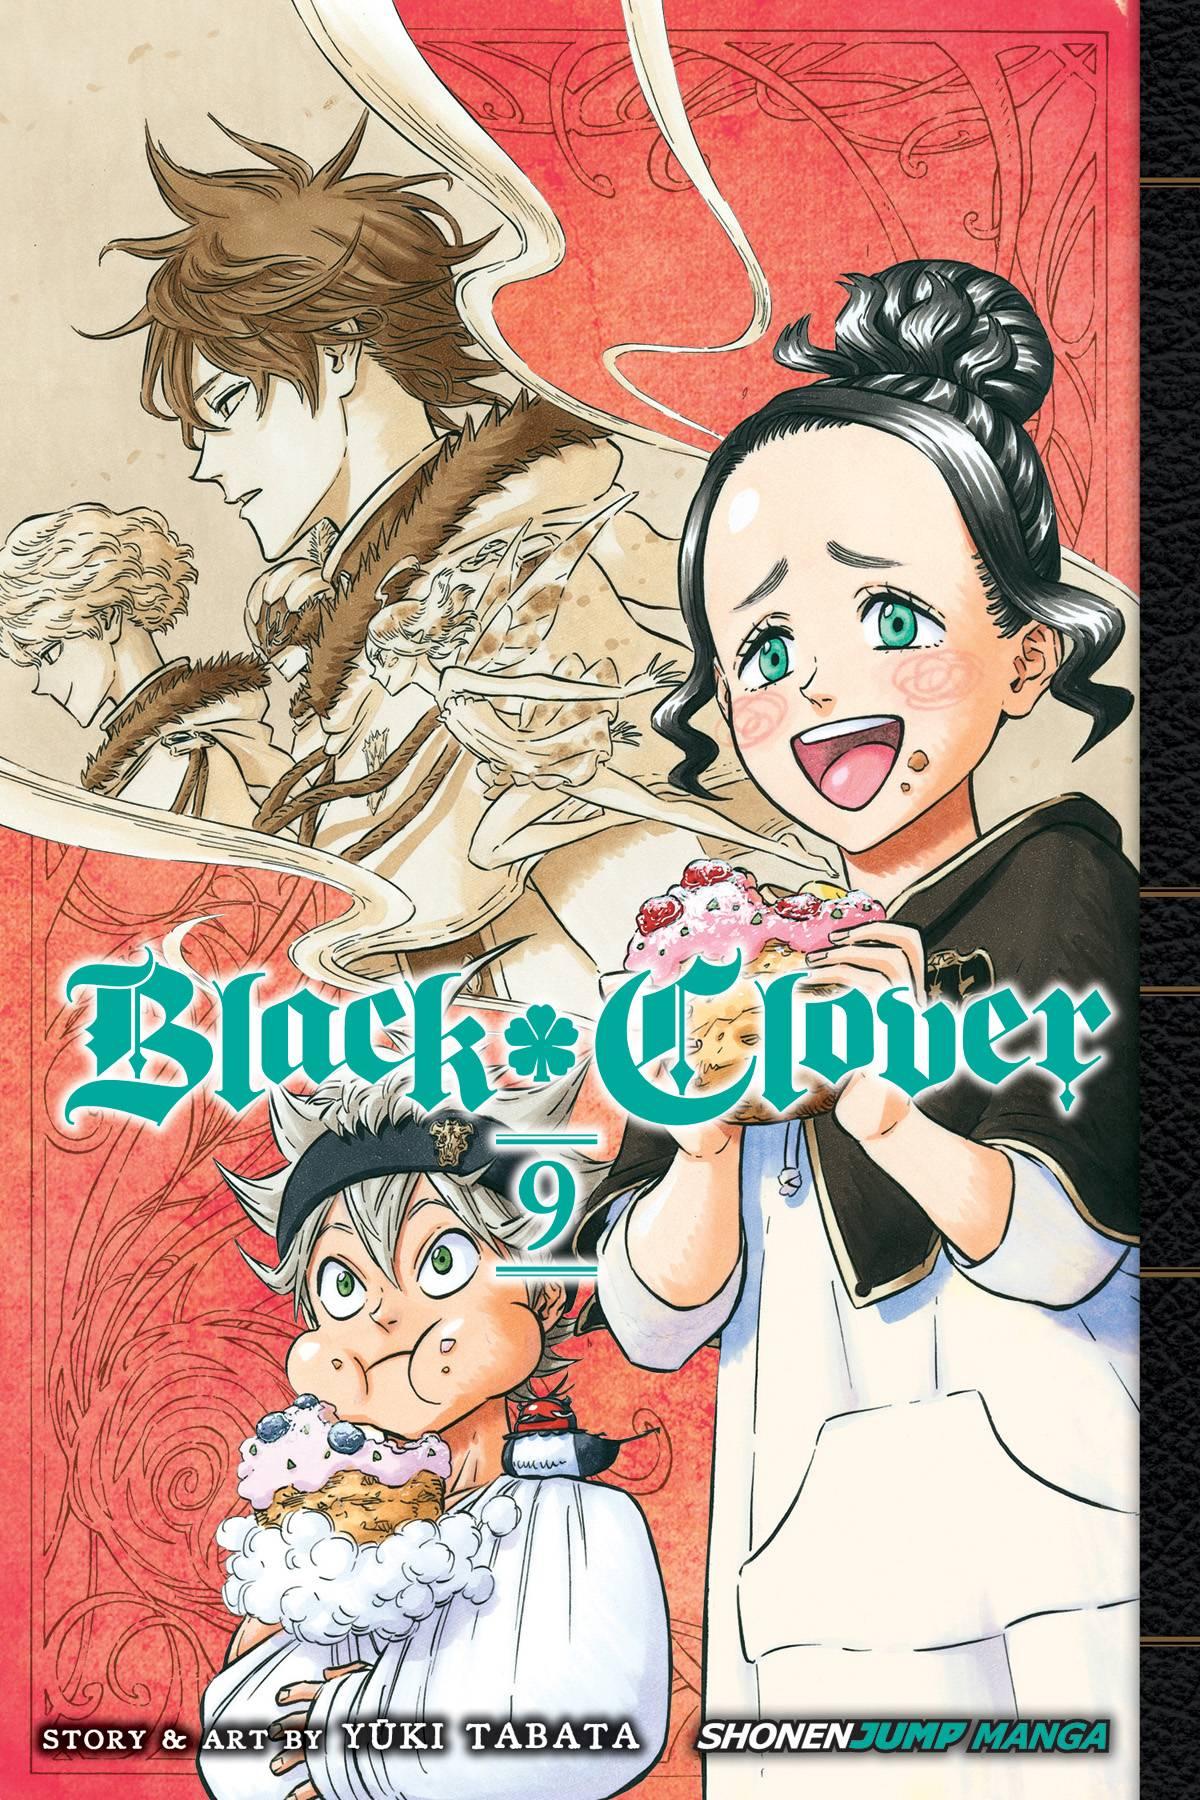 Black Clover #9 (2017)